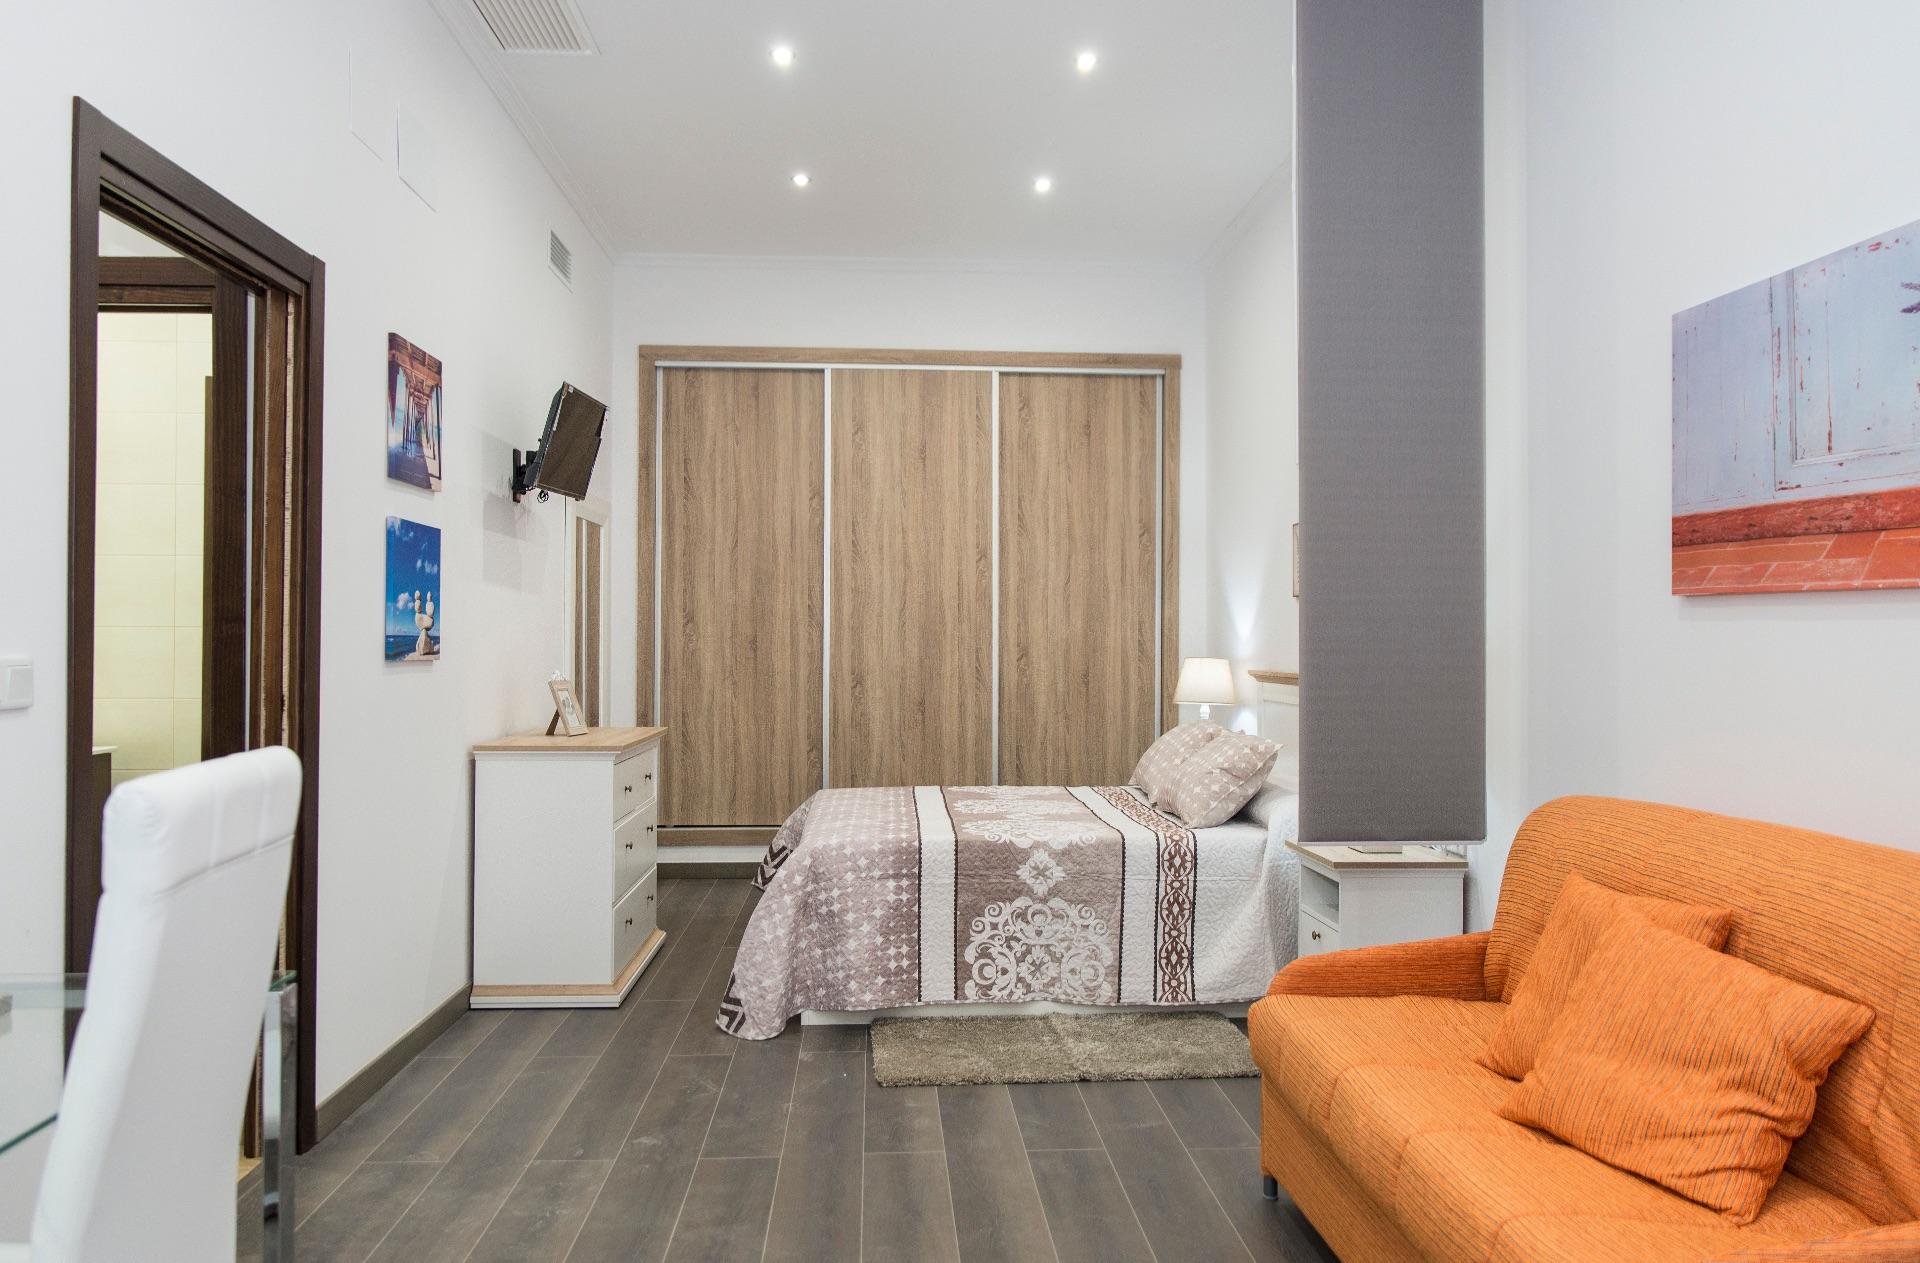 Apartamento en Cordoba, GLORIETA AMADORA, alquiler